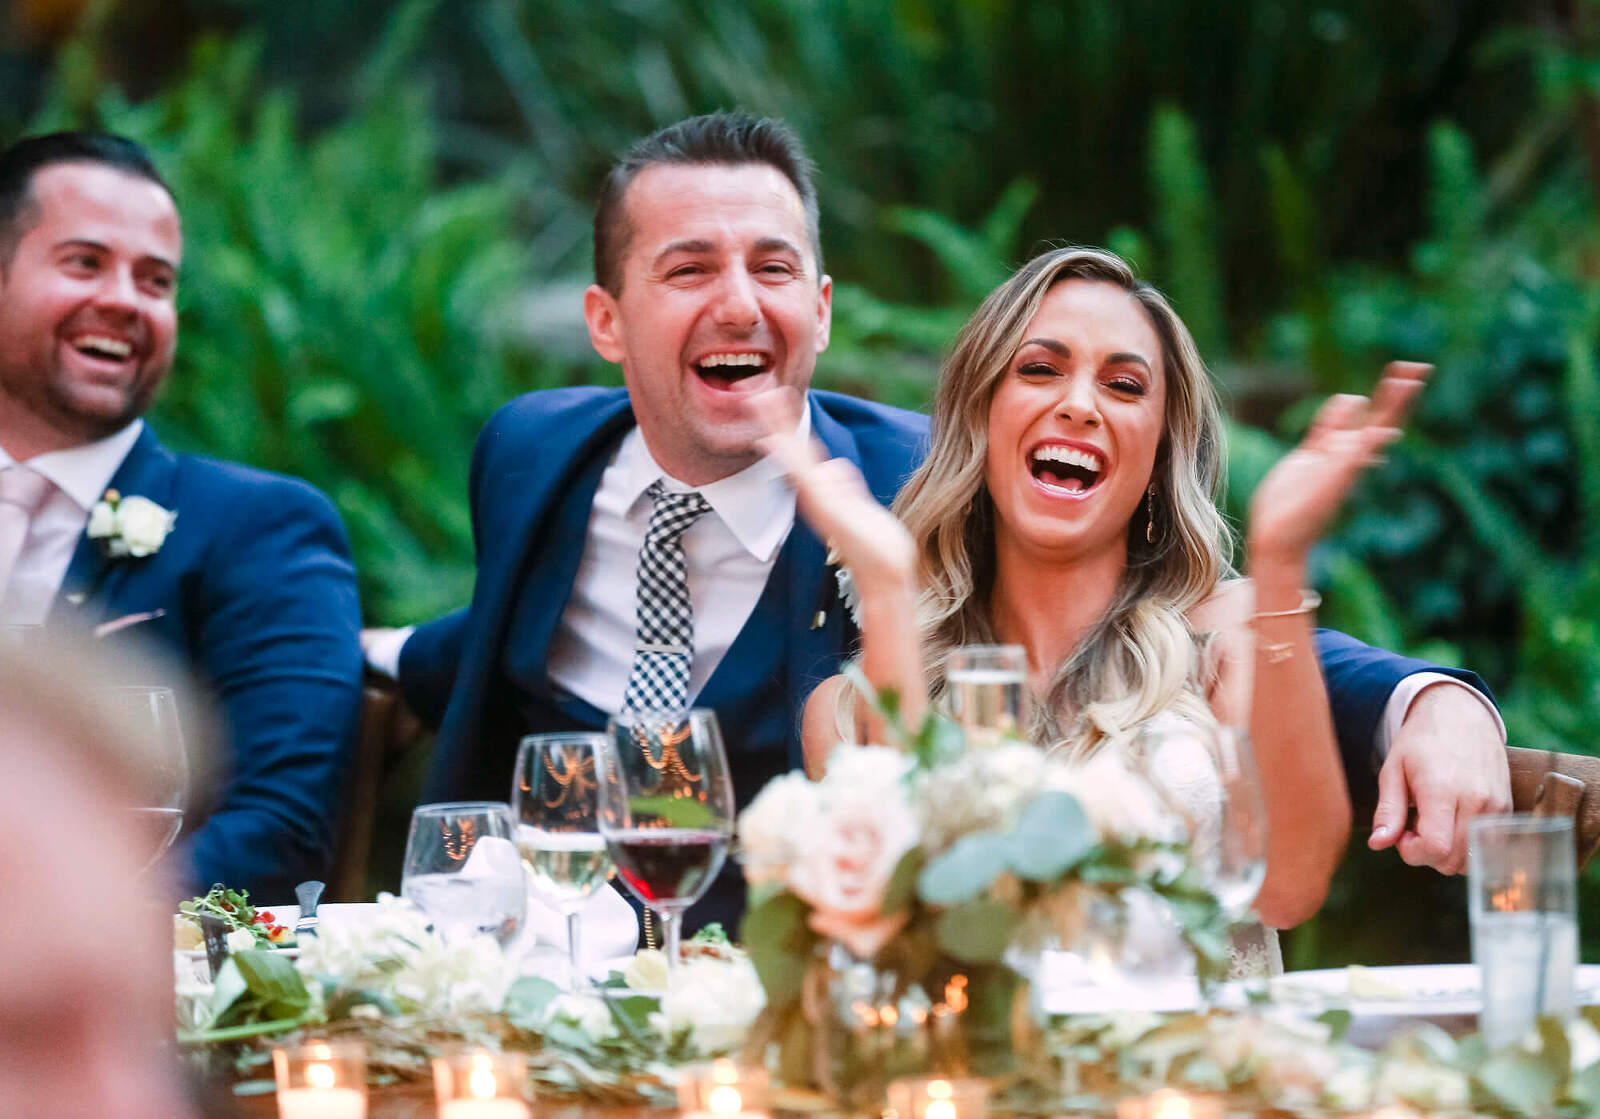 San Francisco wedding photographer - reception, bride laughing